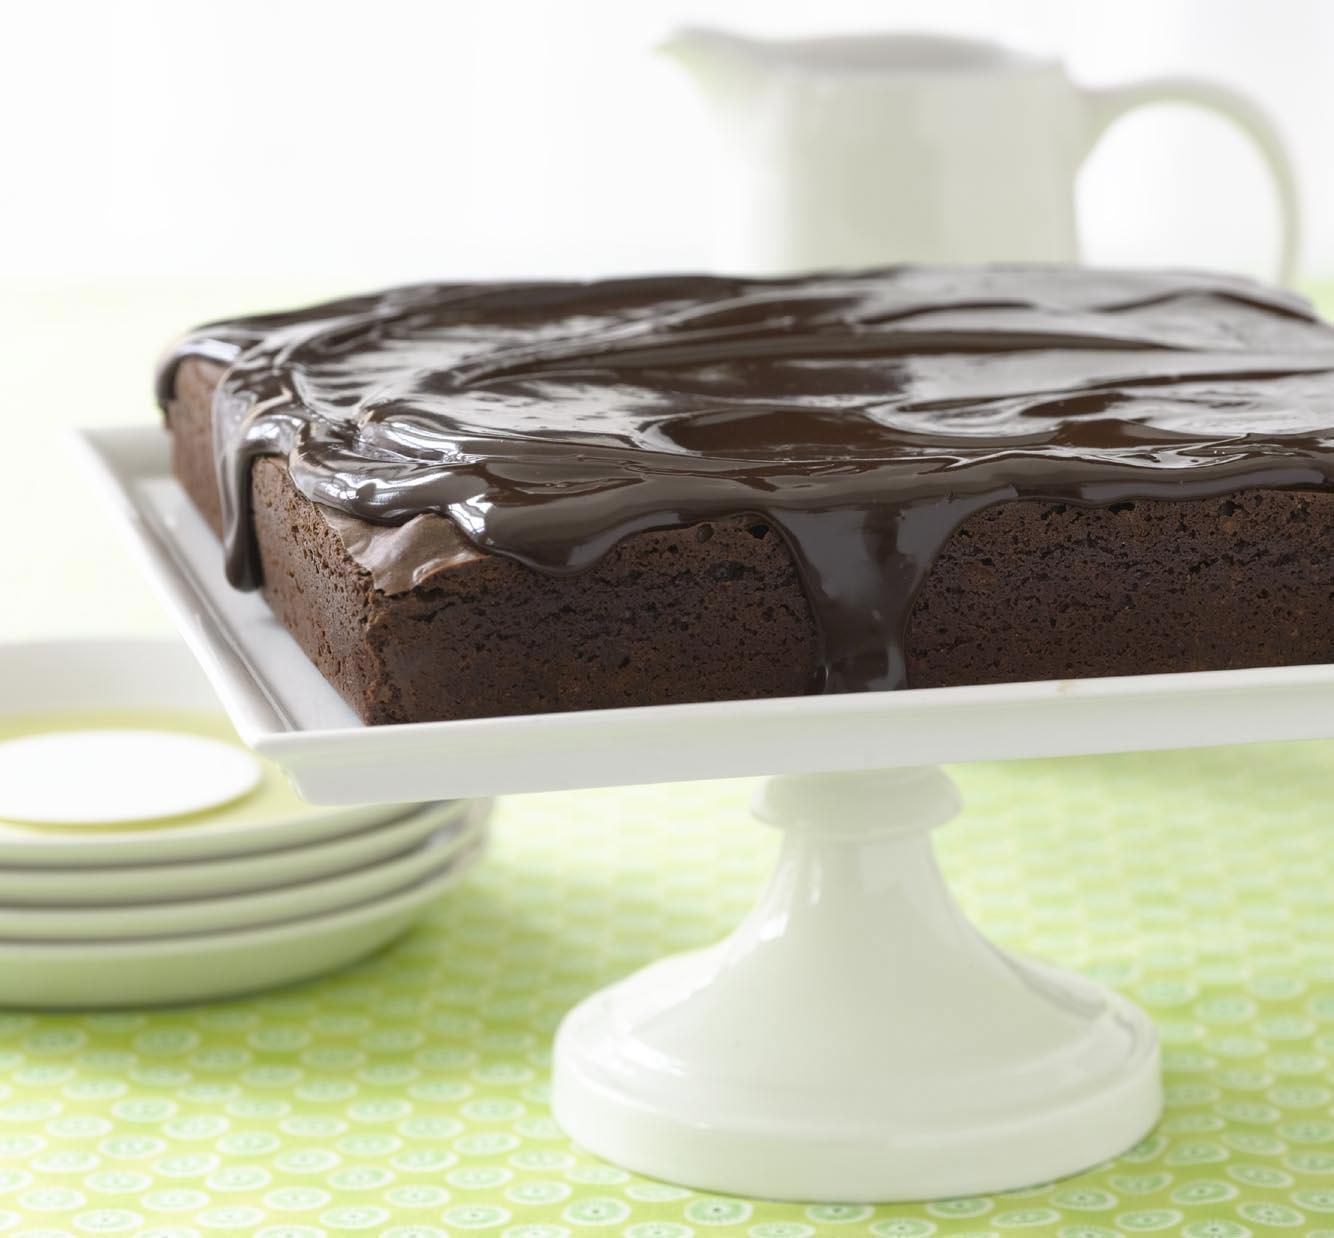 Pound Of Chocolate Cake Recipe Blog Raincoast Books